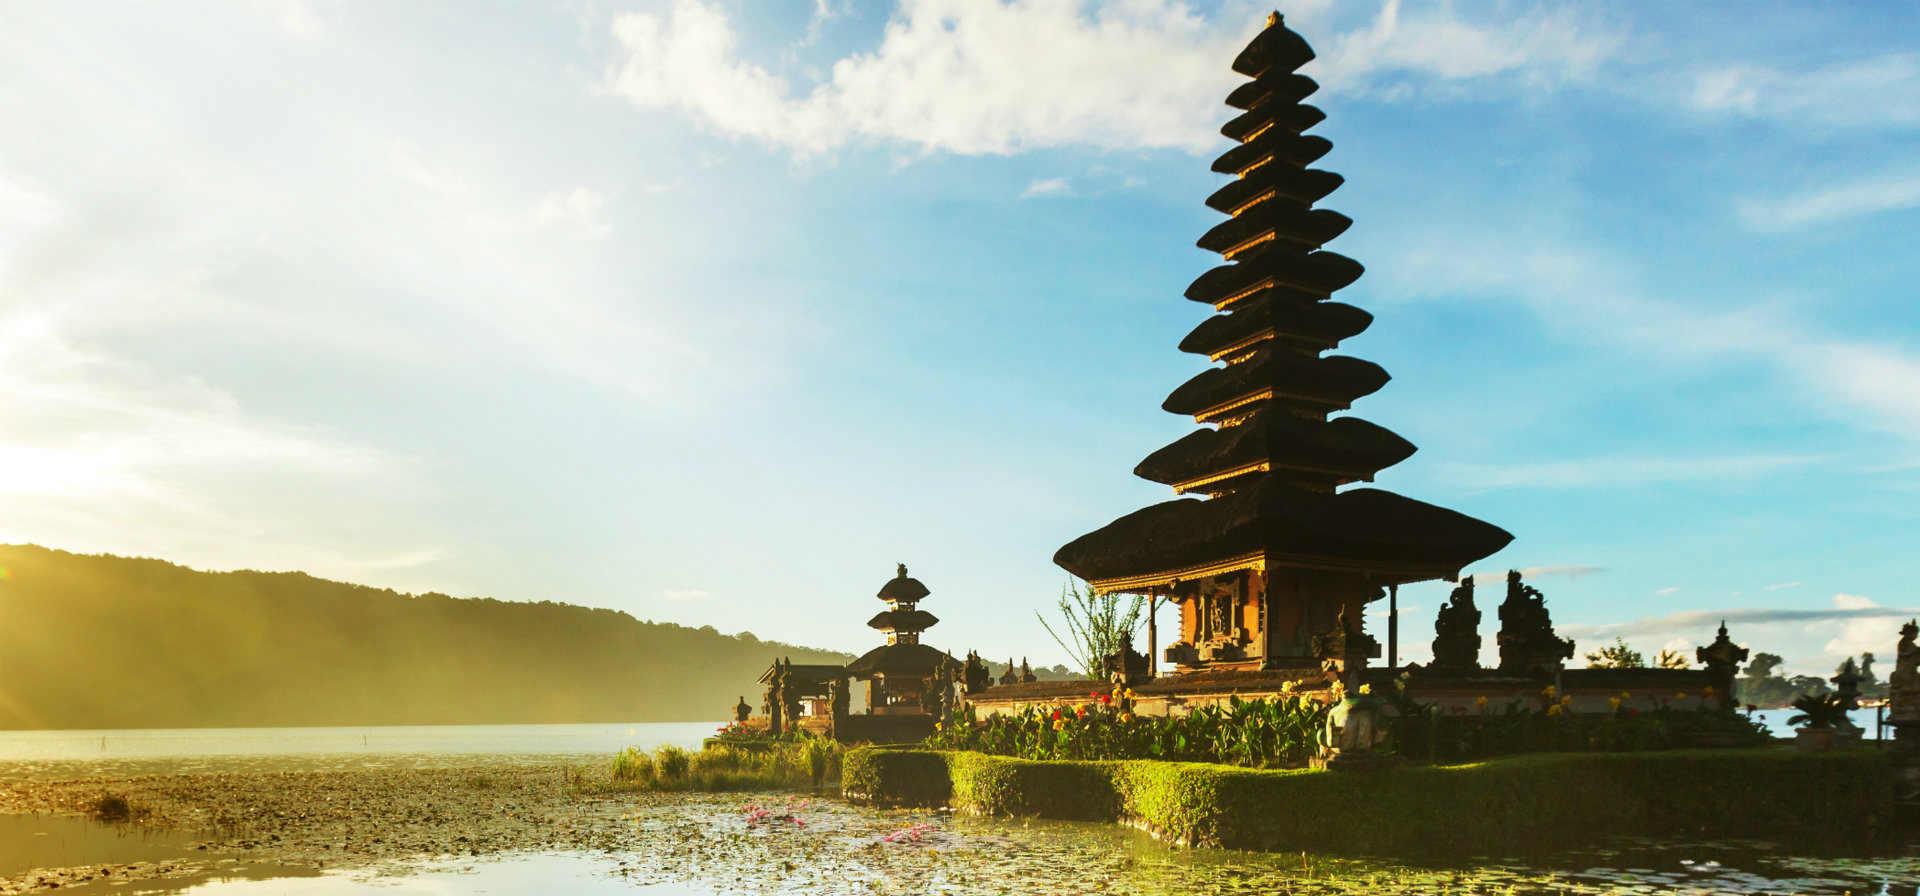 Bali's Magic of Love